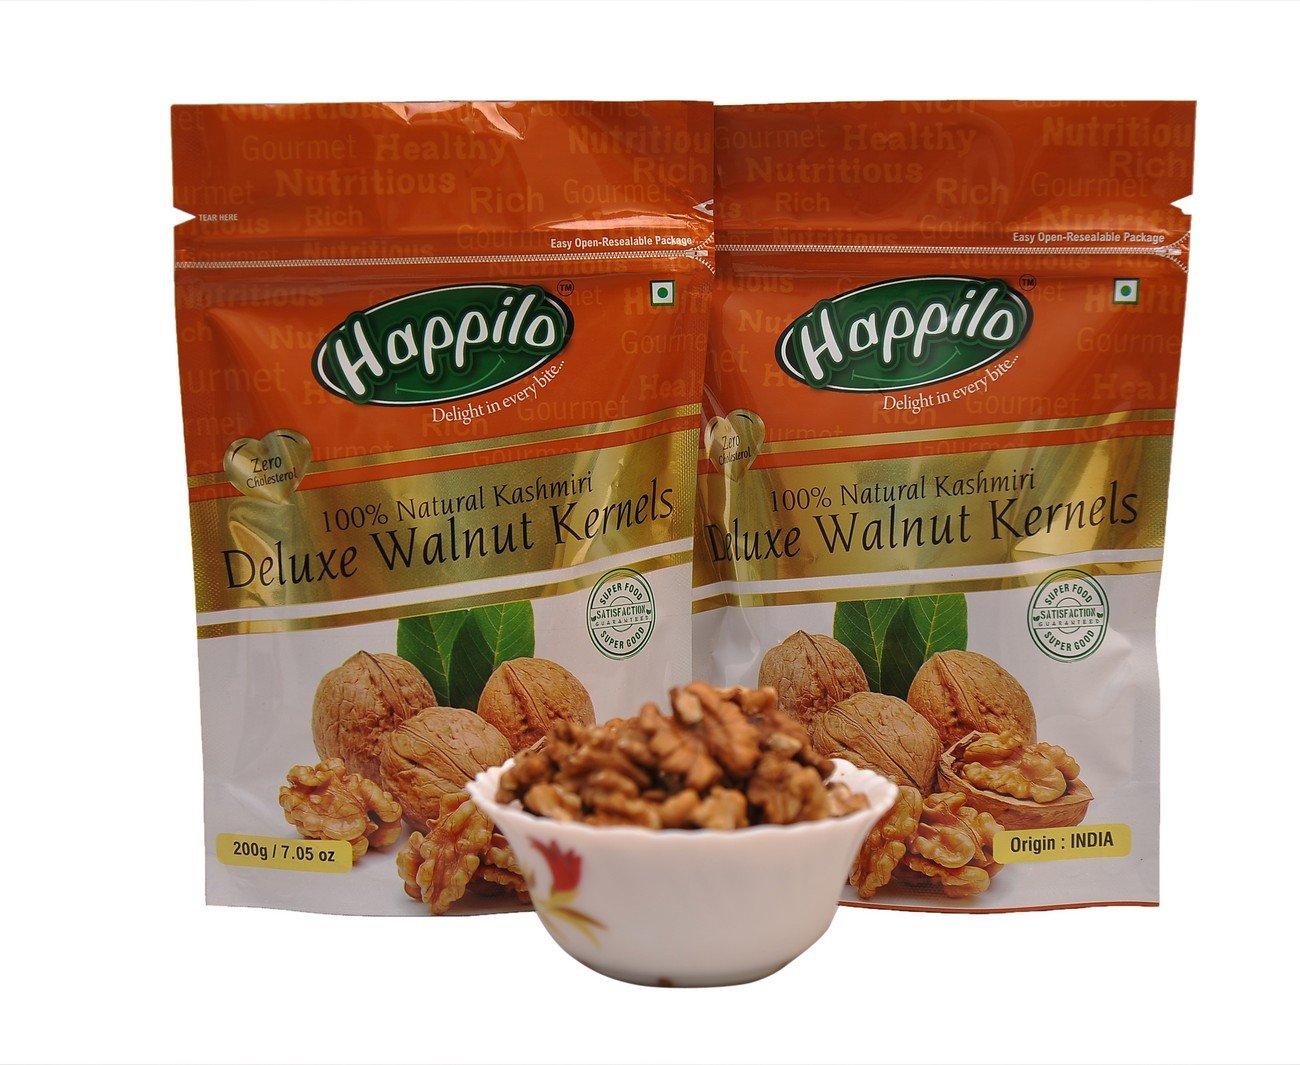 Happilo Deluxe 100% Natural Kashmiri Walnut Kernels, 200g (Pack of 2)